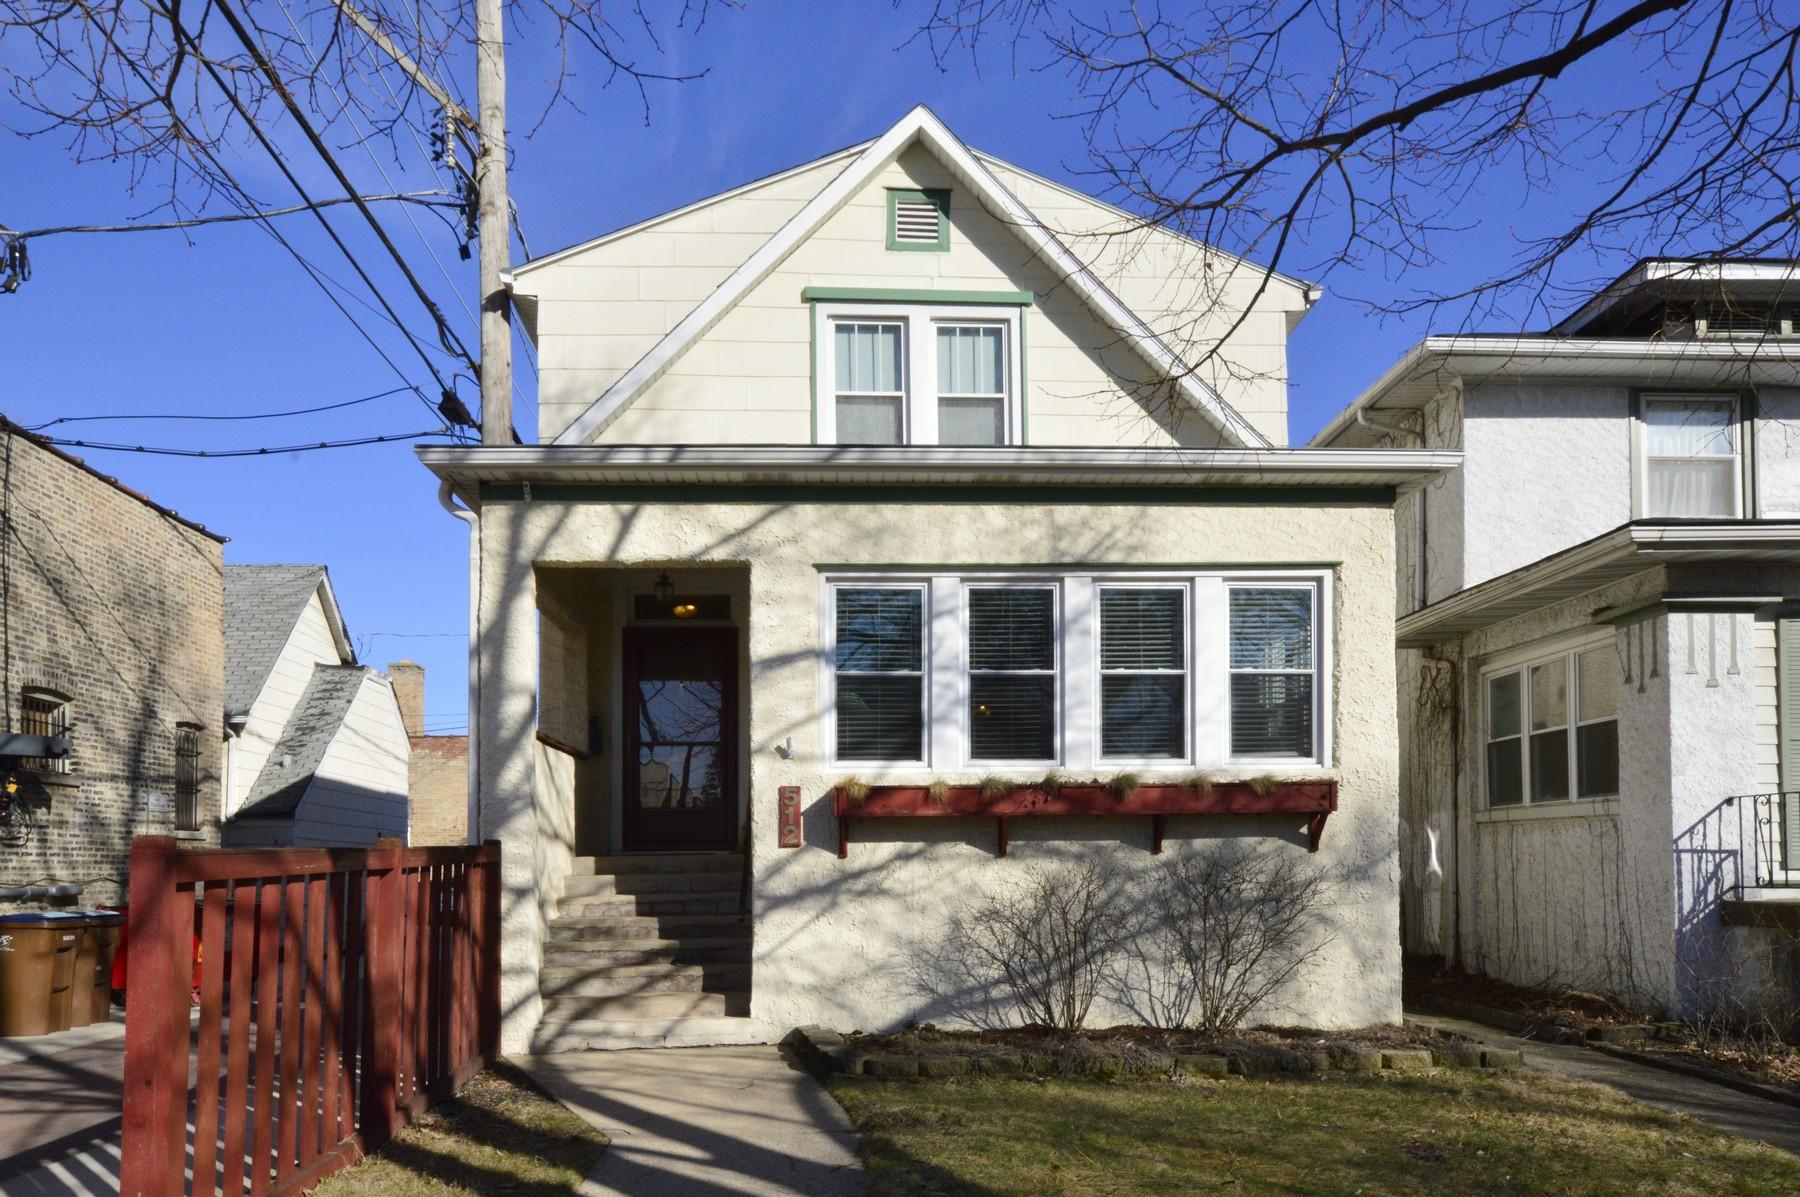 Nhà ở một gia đình vì Bán tại Beautifully Maintained Home 512 S Wesley Avenue Oak Park, Illinois, 60304 Hoa Kỳ